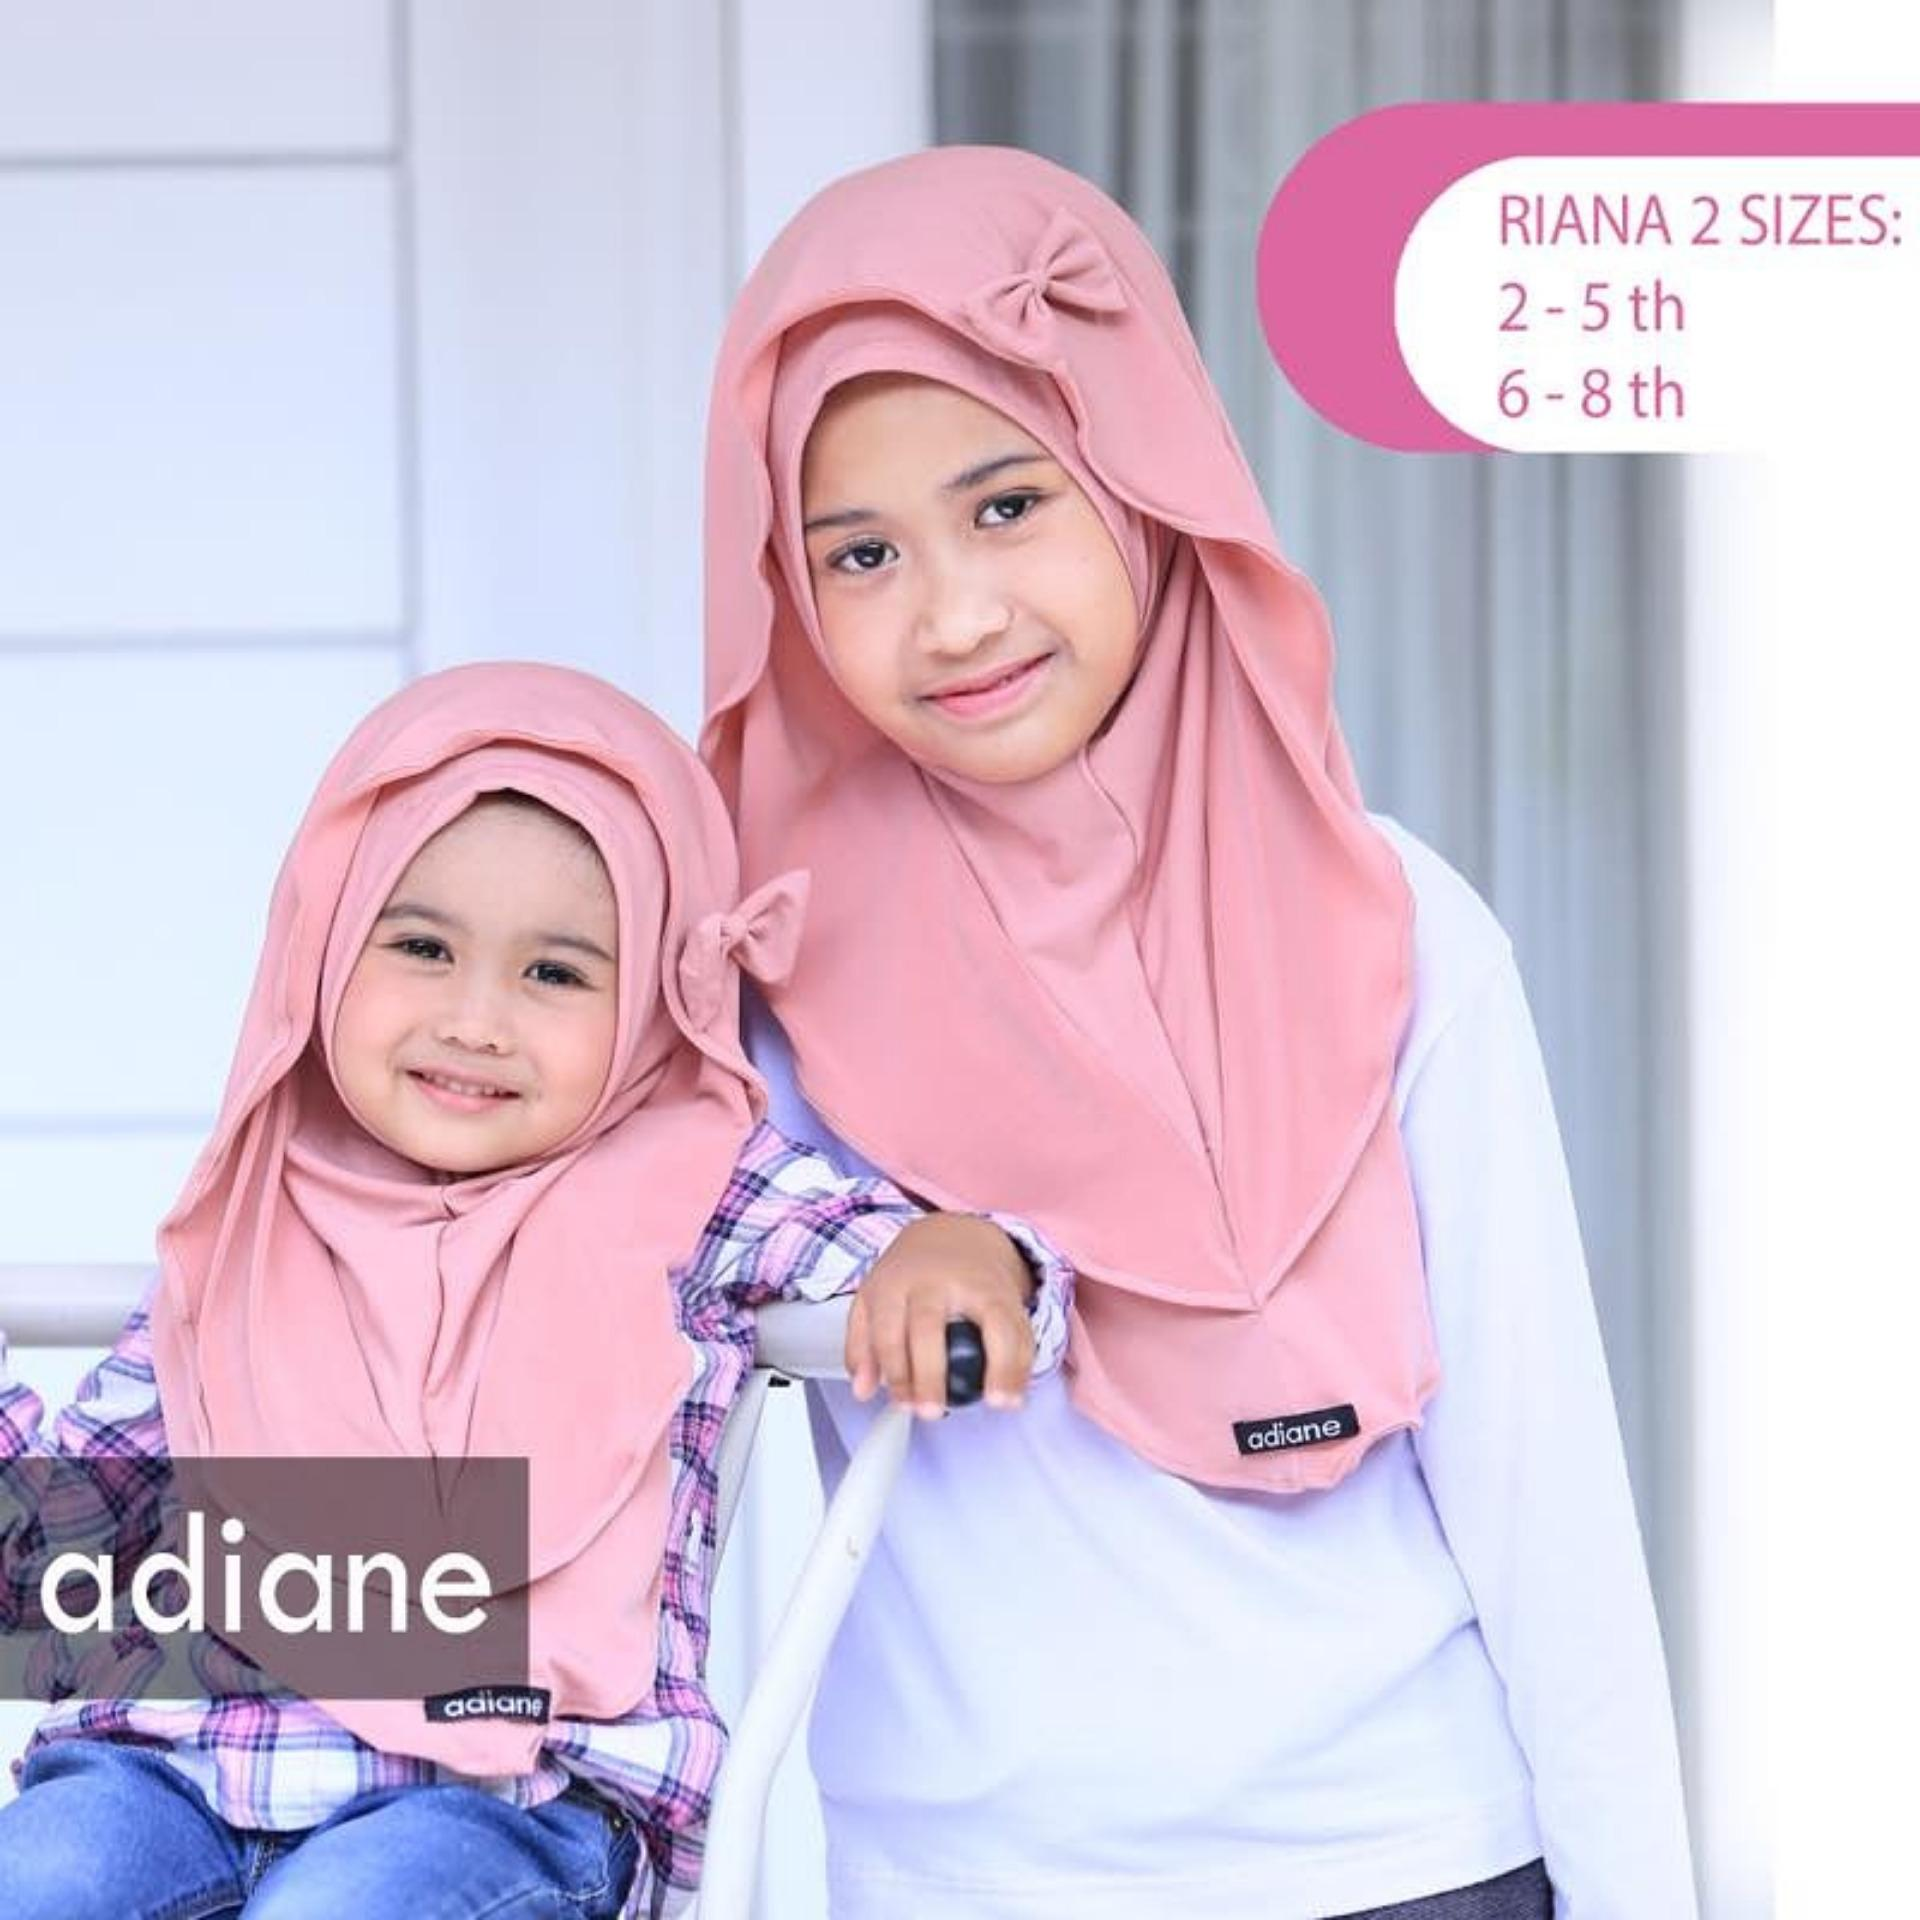 Beli Hqo Kerudung Hijab Jilbab Pashmina Instan Anak Riana Pink Cicil